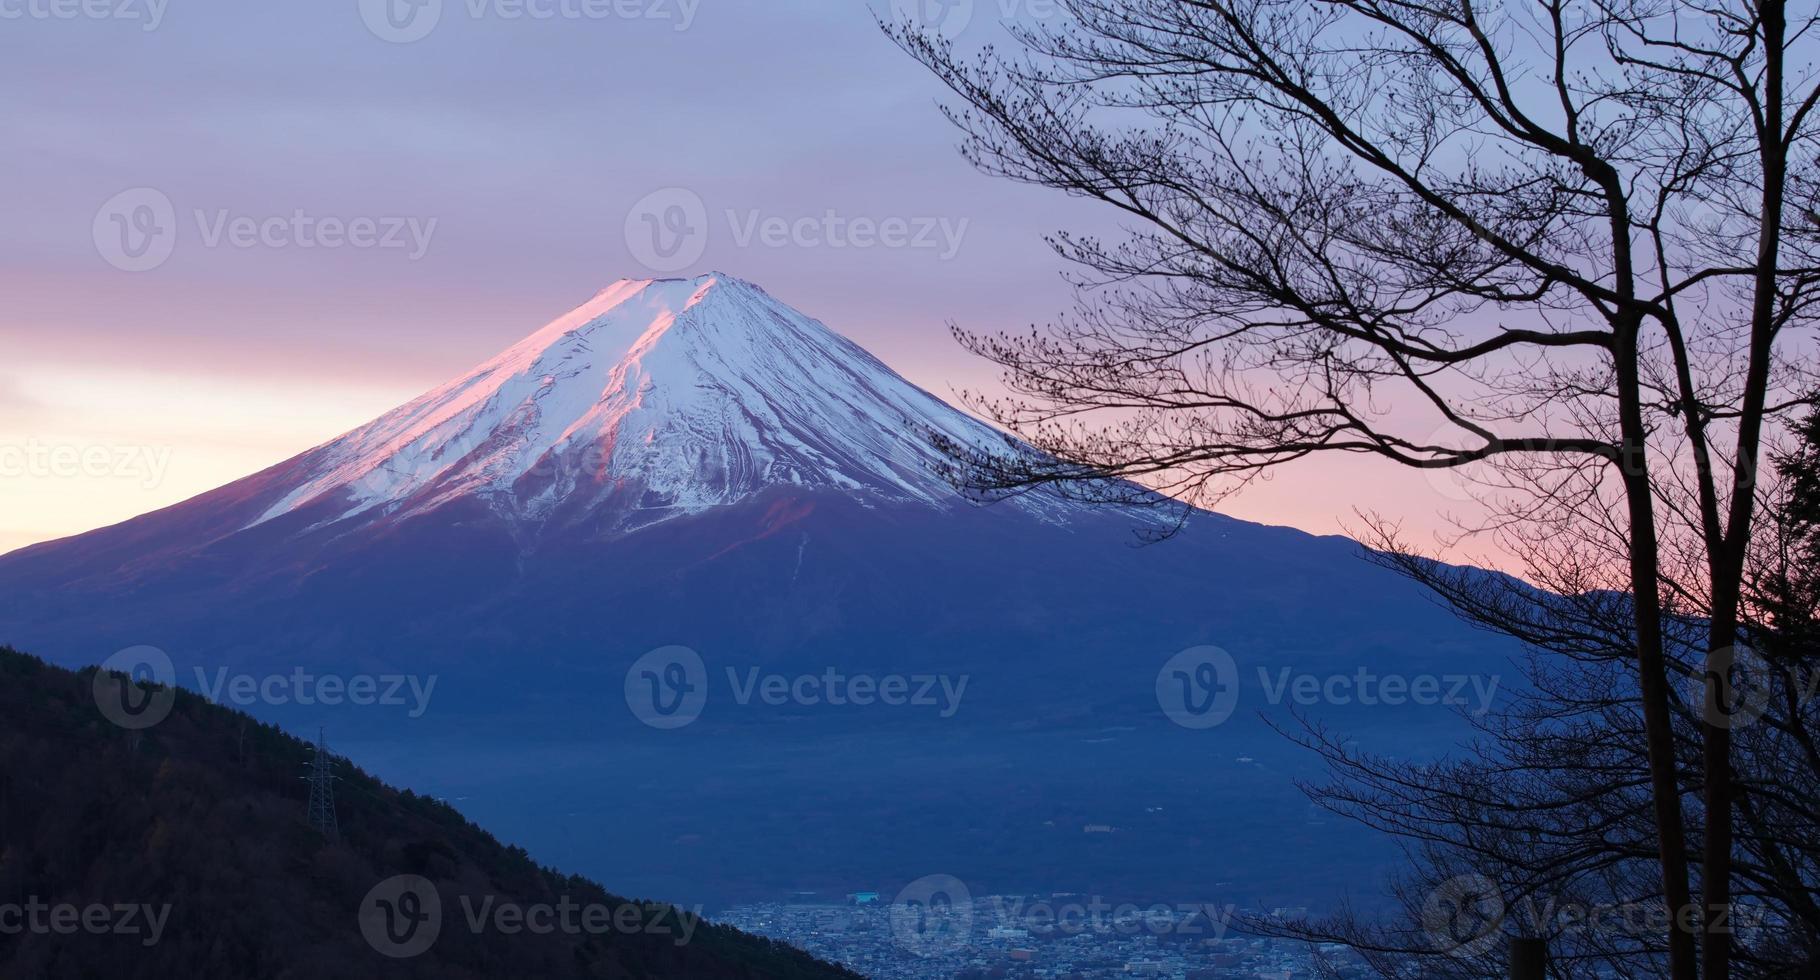 Montagne fuji au matin d'hiver du lac kawaguchiko photo